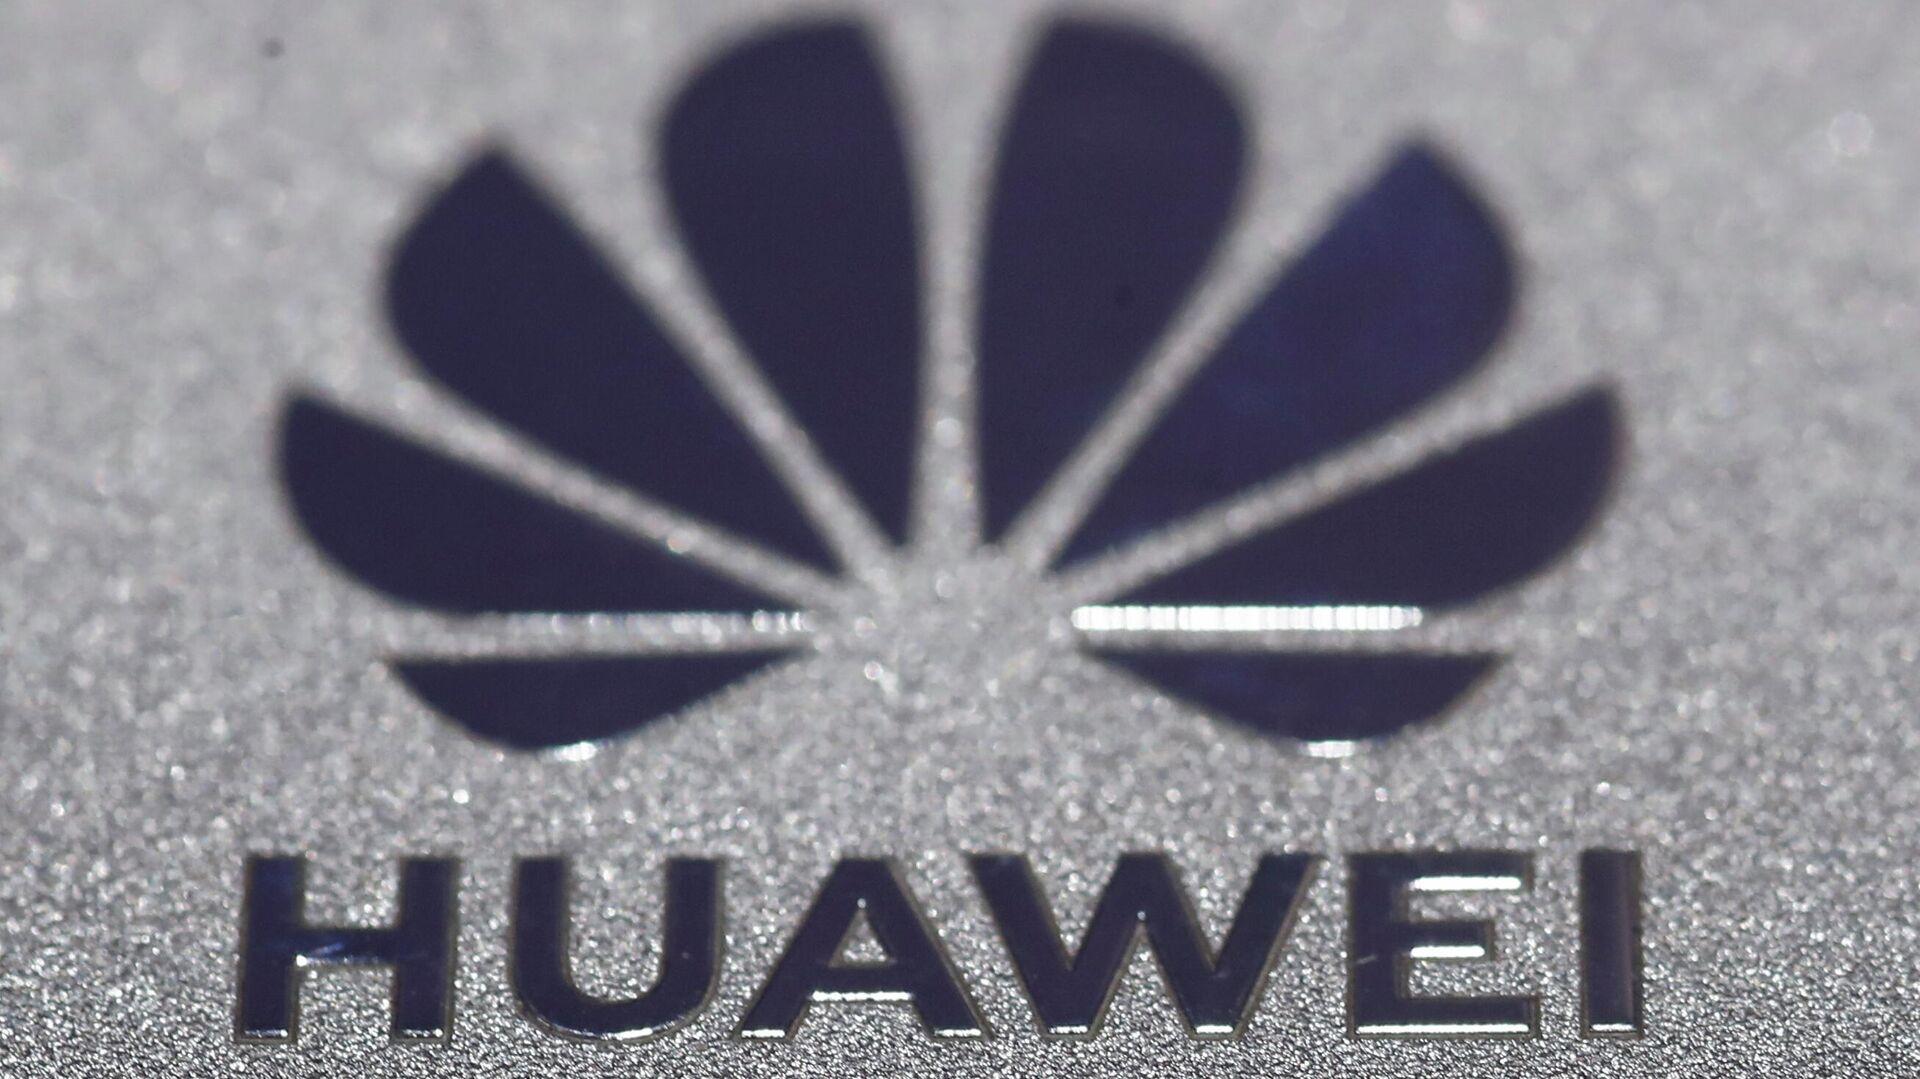 Huawei logo is seen during Munich Auto Show, IAA Mobility 2021 in Munich, Germany, September 8, 2021. REUTERS/Wolfgang Rattay - Sputnik International, 1920, 25.09.2021